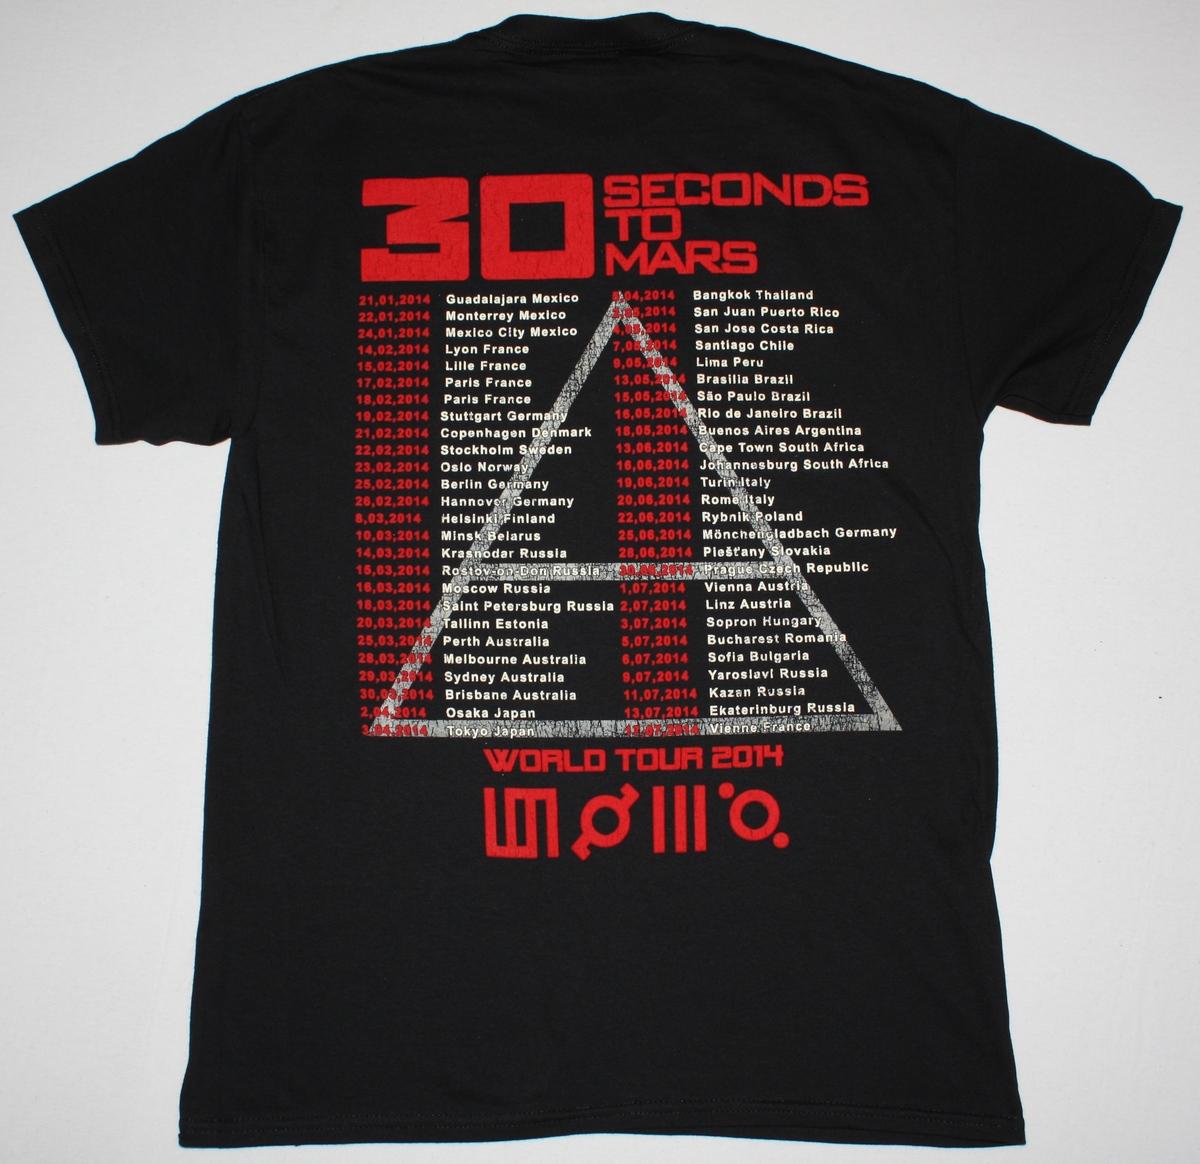 30 SECONDS TO MARS WORLD TOUR 2014  NEW BLACK T-SHIRT